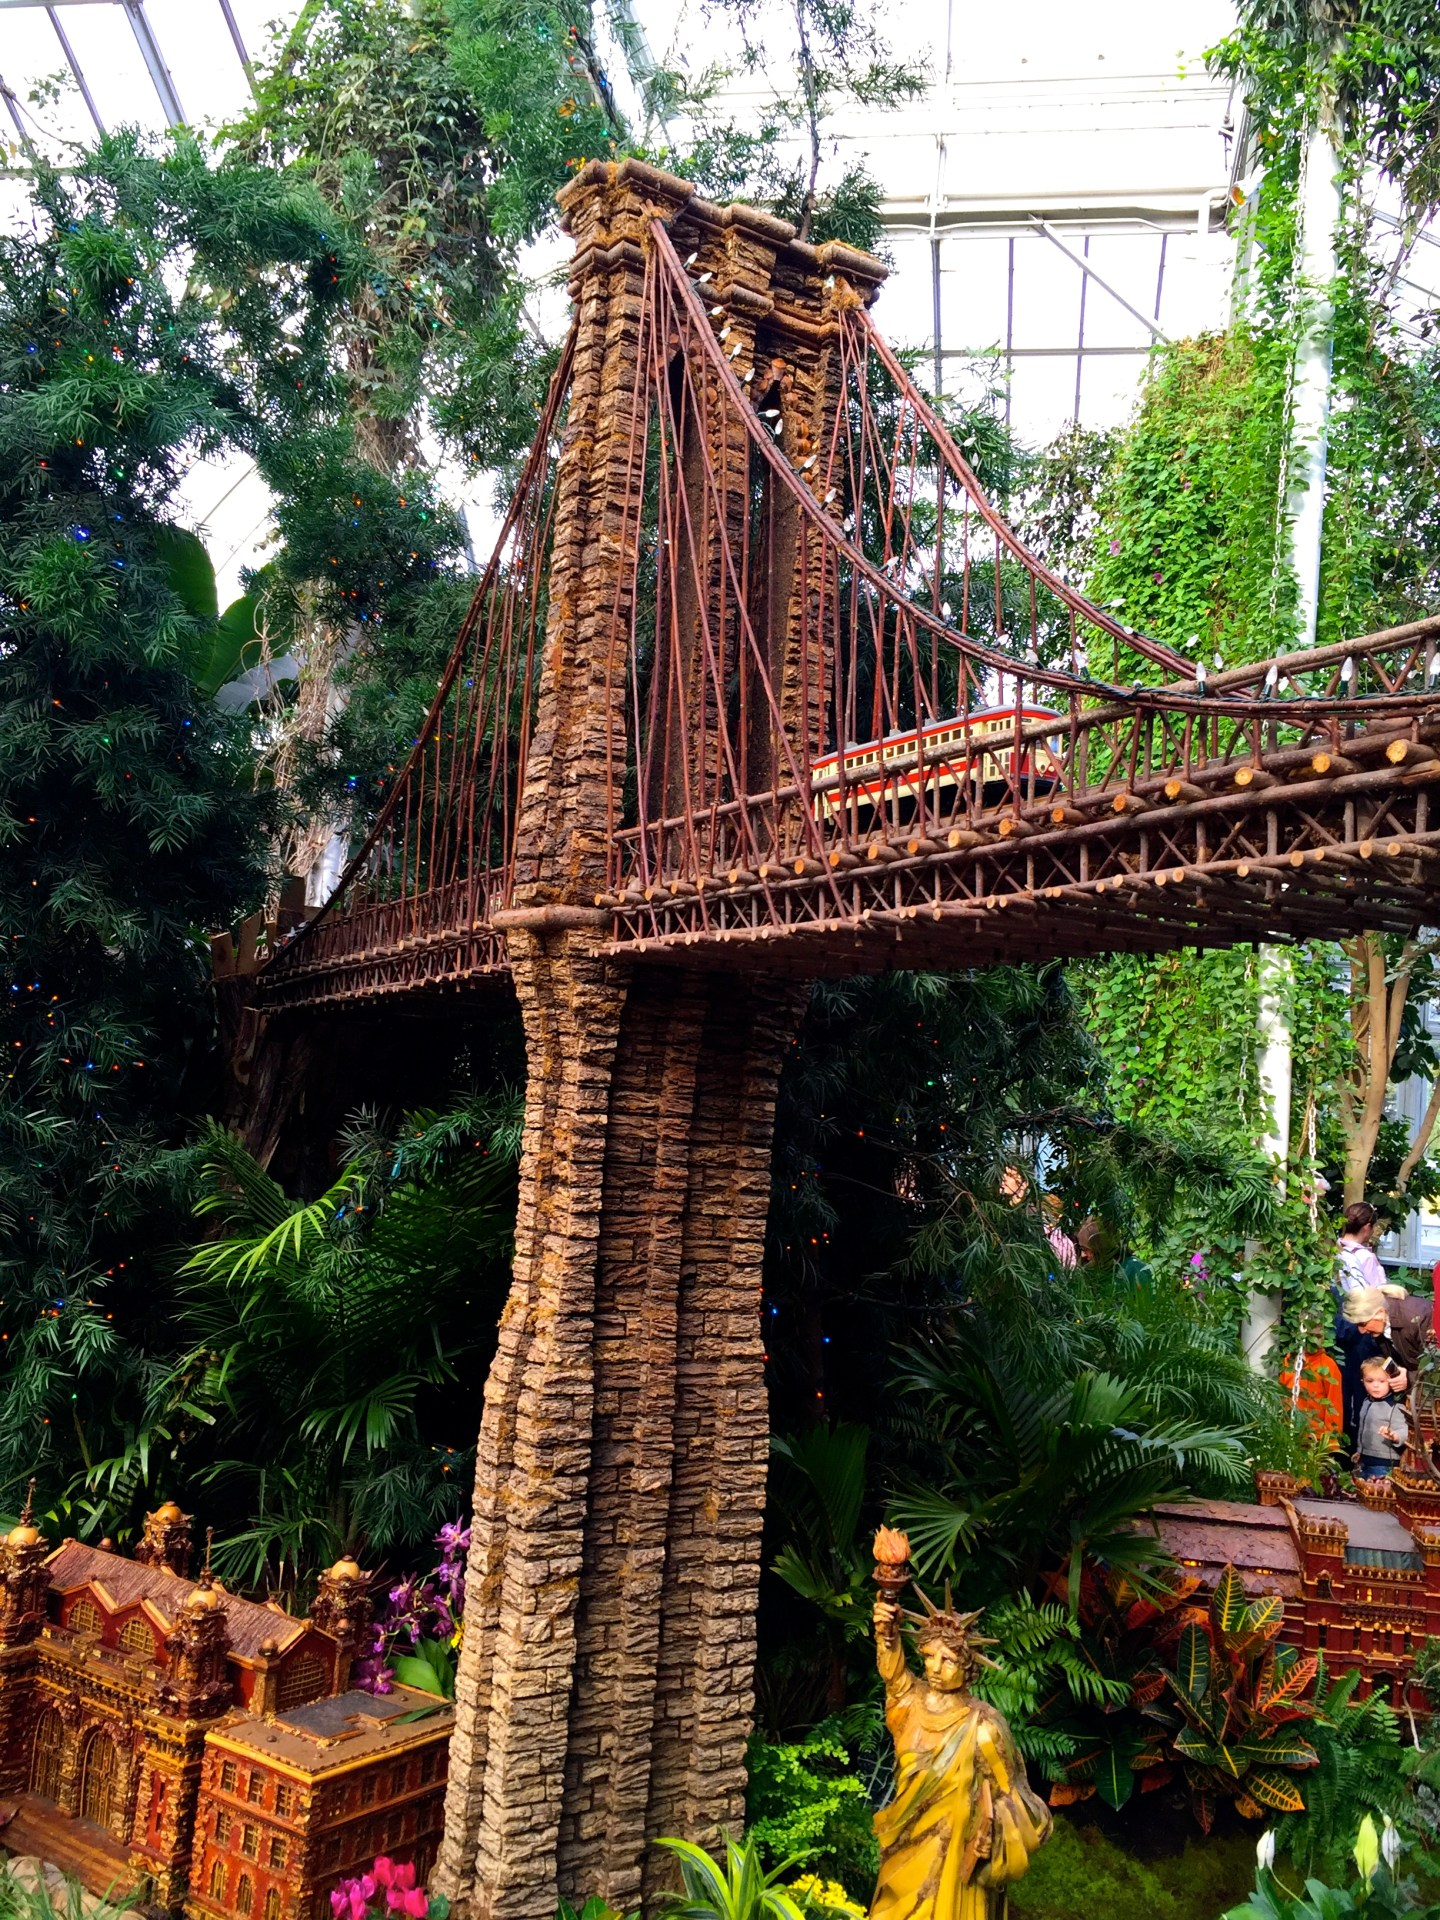 Brooklyn Bridge at the Holiday Train Show at the New York Botanical Garden